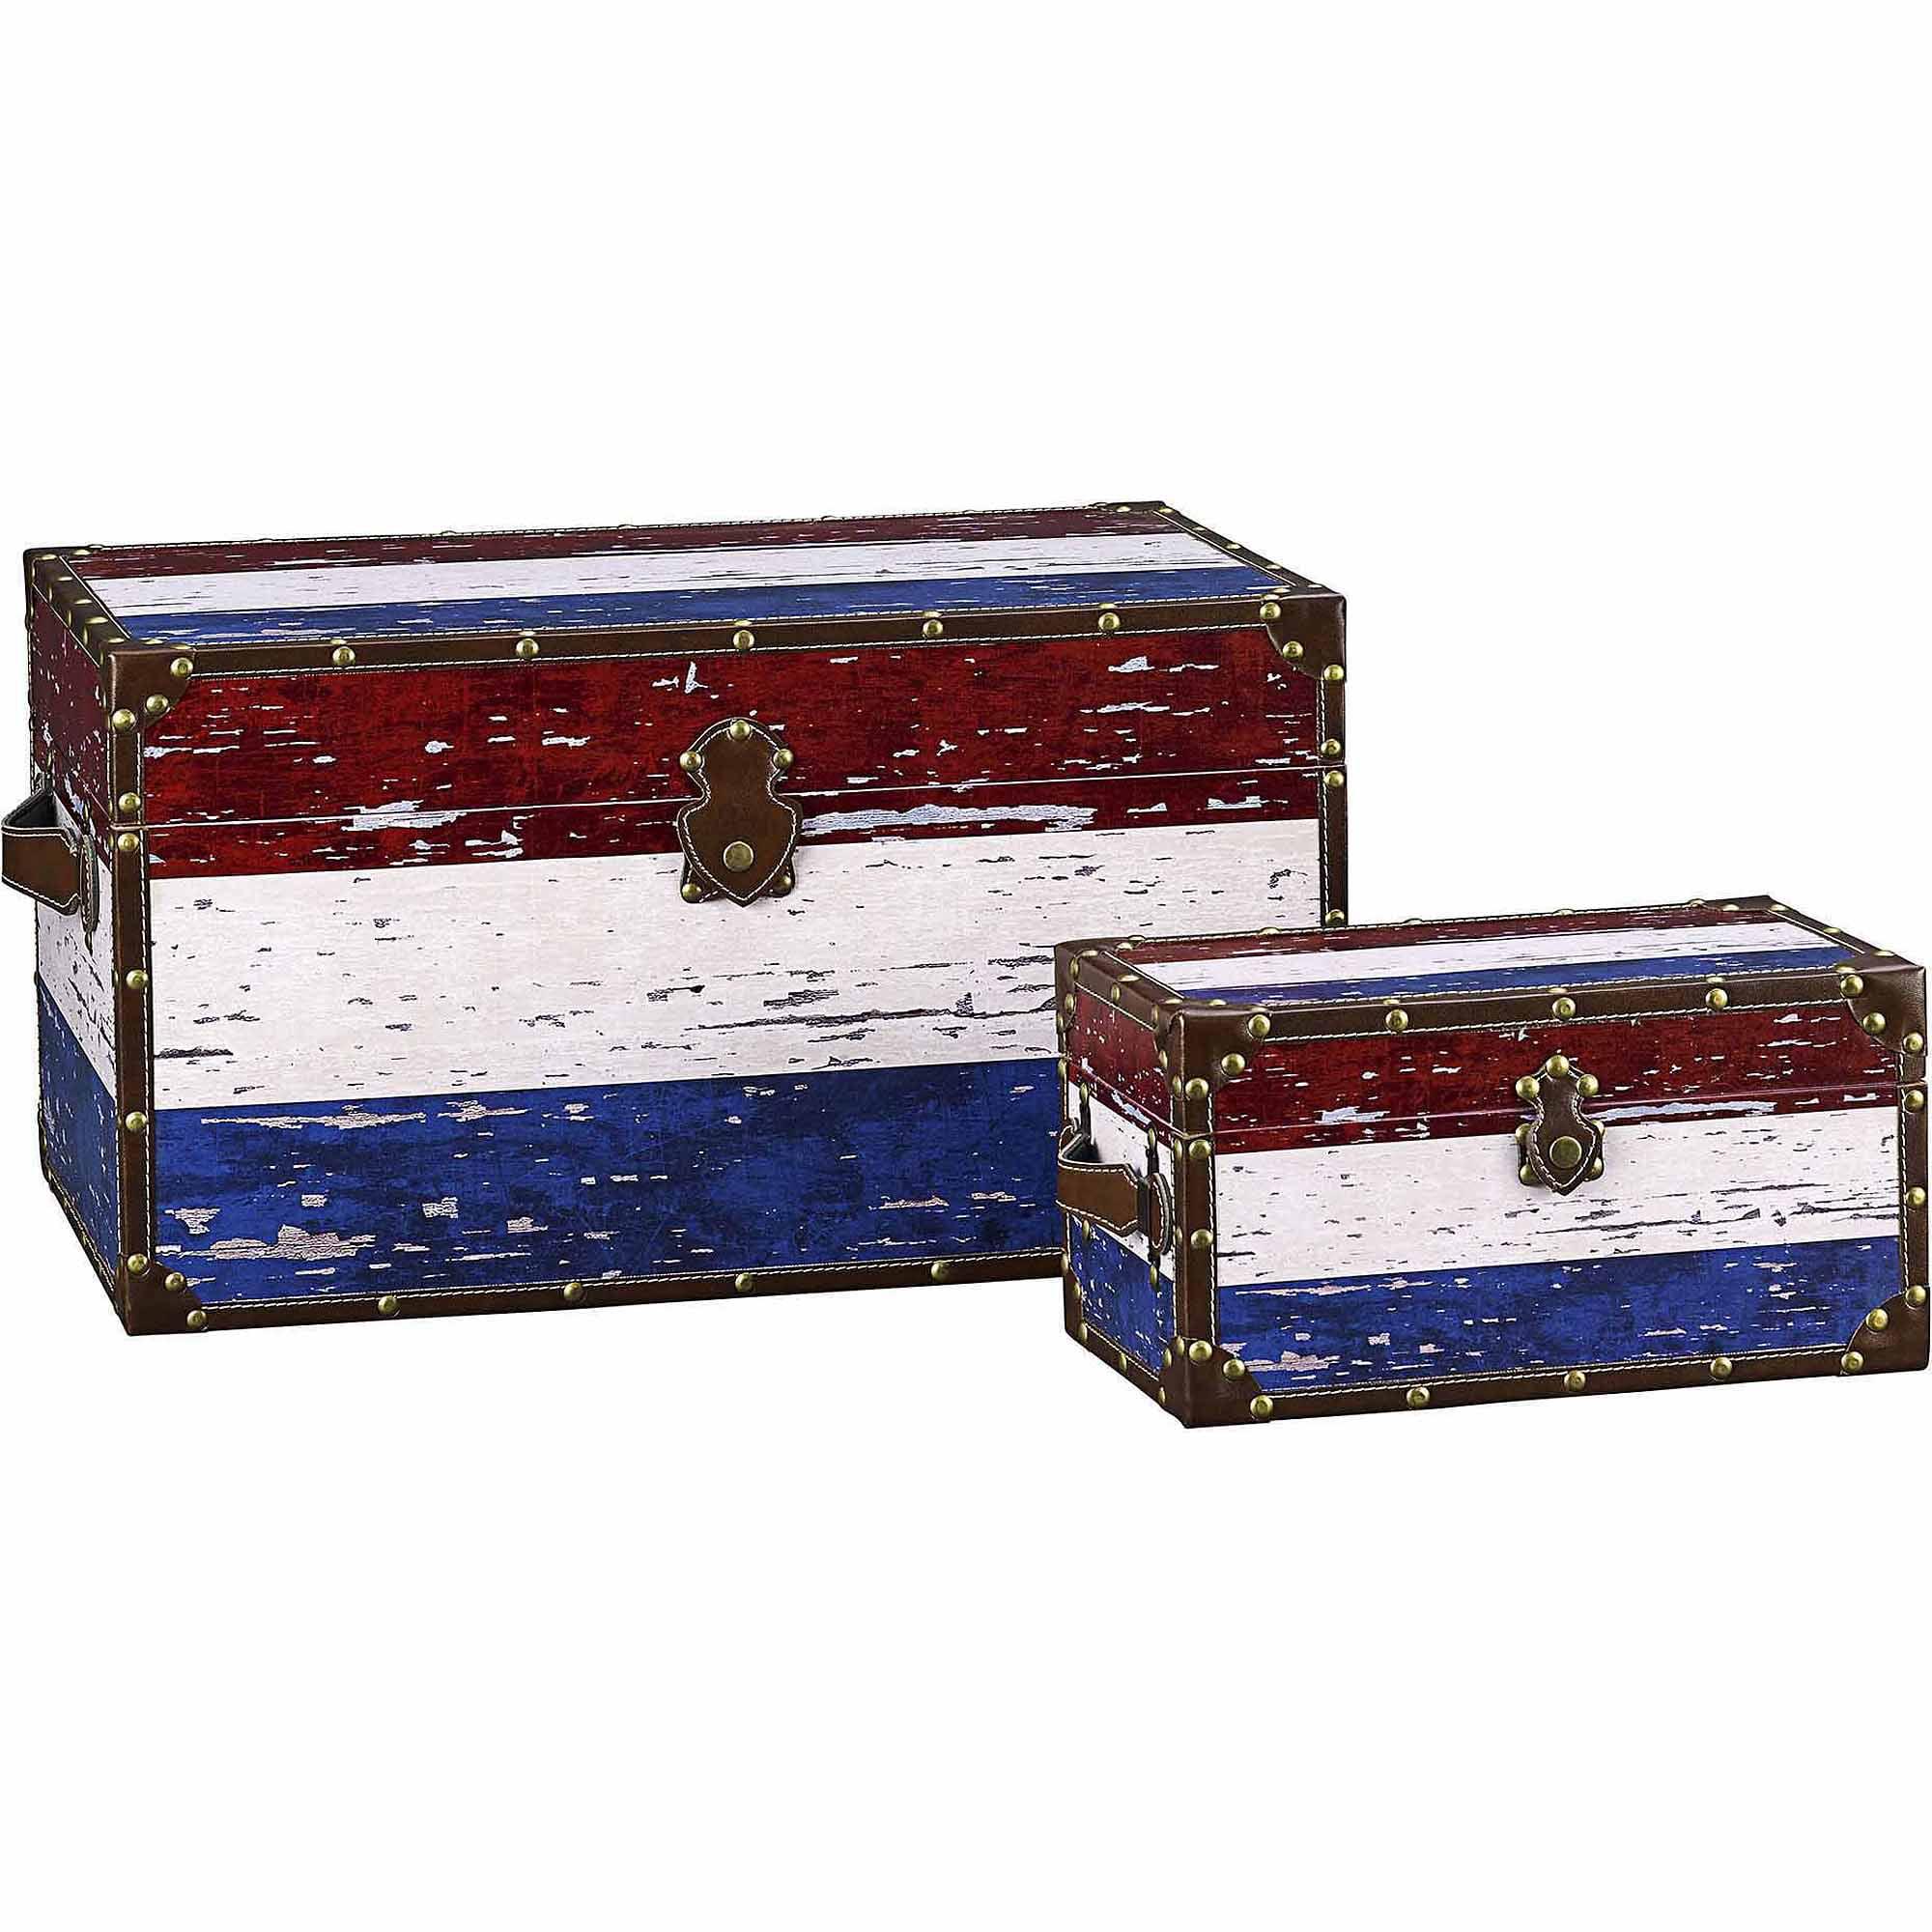 household essentials decorative storage trunk american flag design set of 2 walmartcom - Decorative Storage Trunks